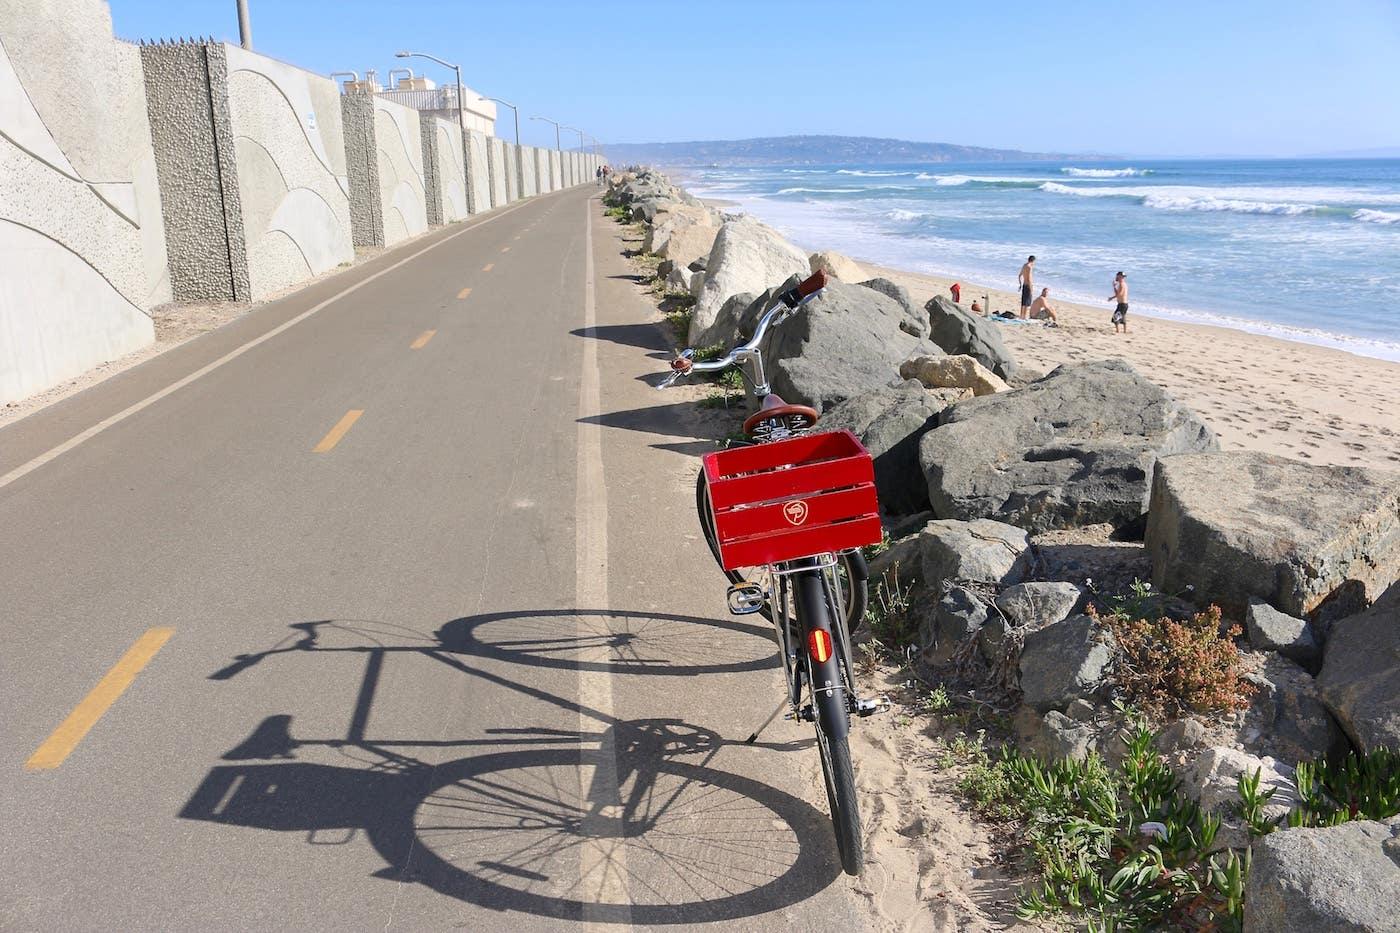 The Marvin Braude Bike Trail near Dockweiler State Beach